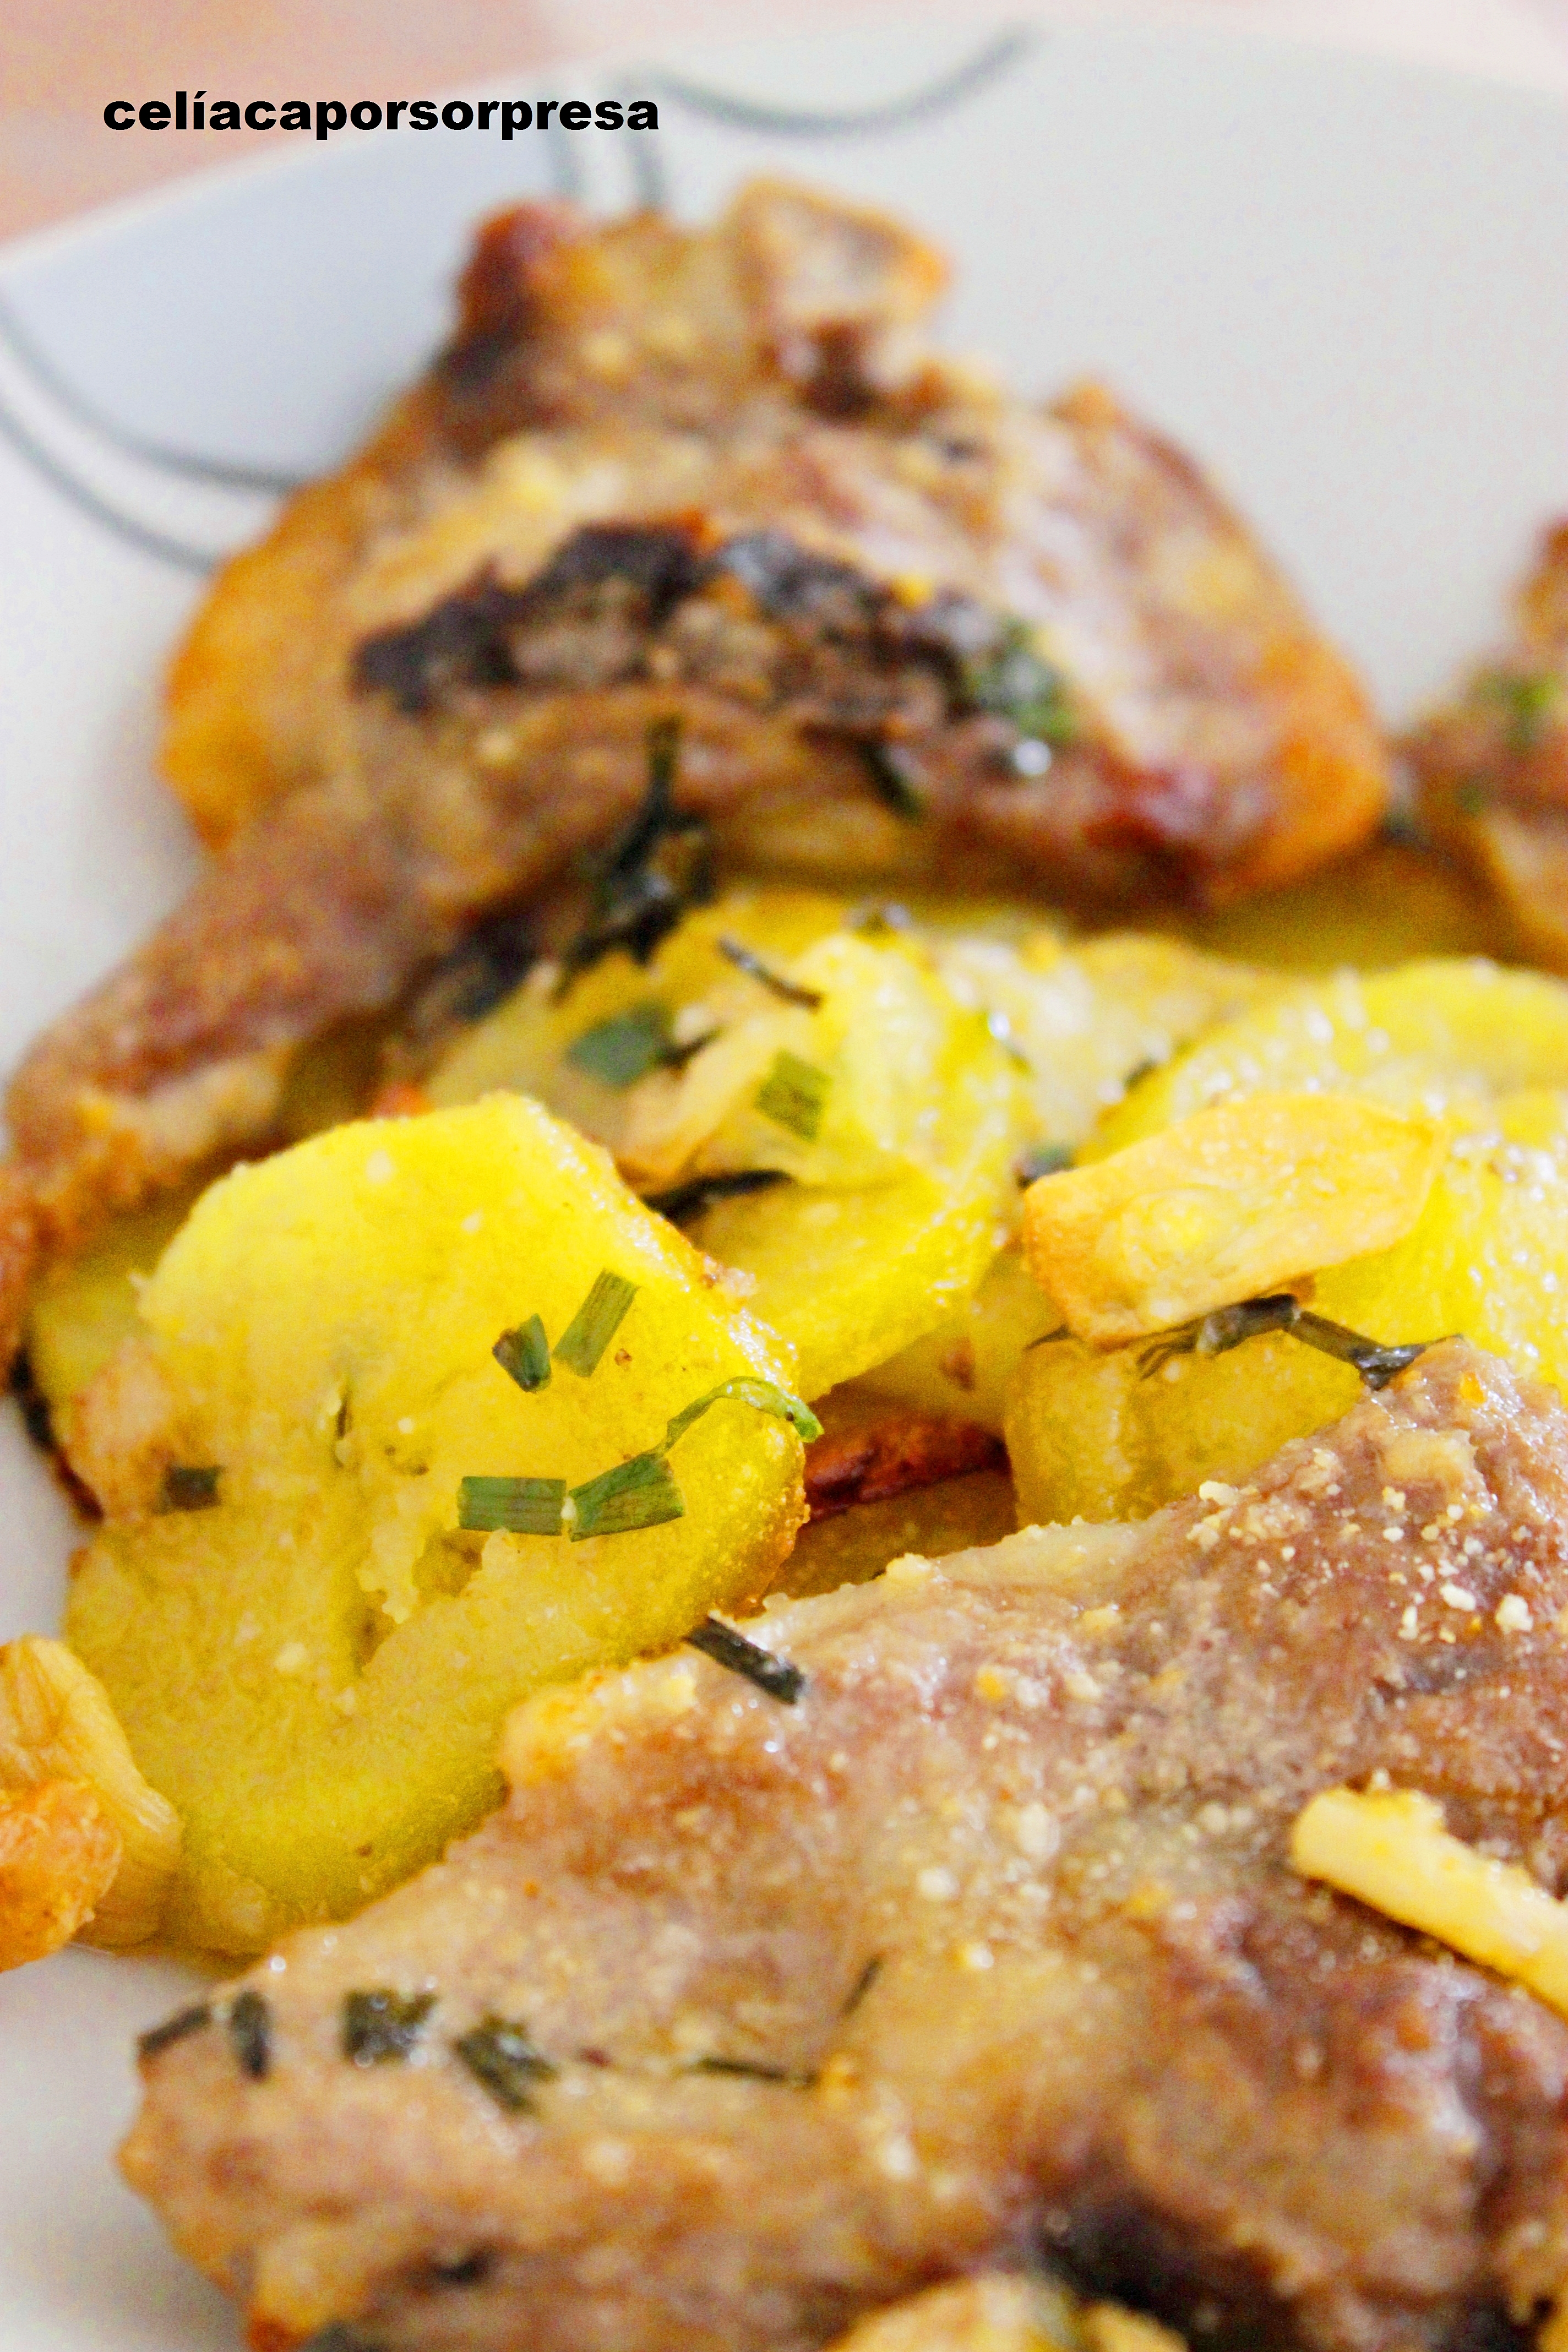 Chuletas de cordero con patatas al cebollino horno - Chuletas de cordero al horno ...